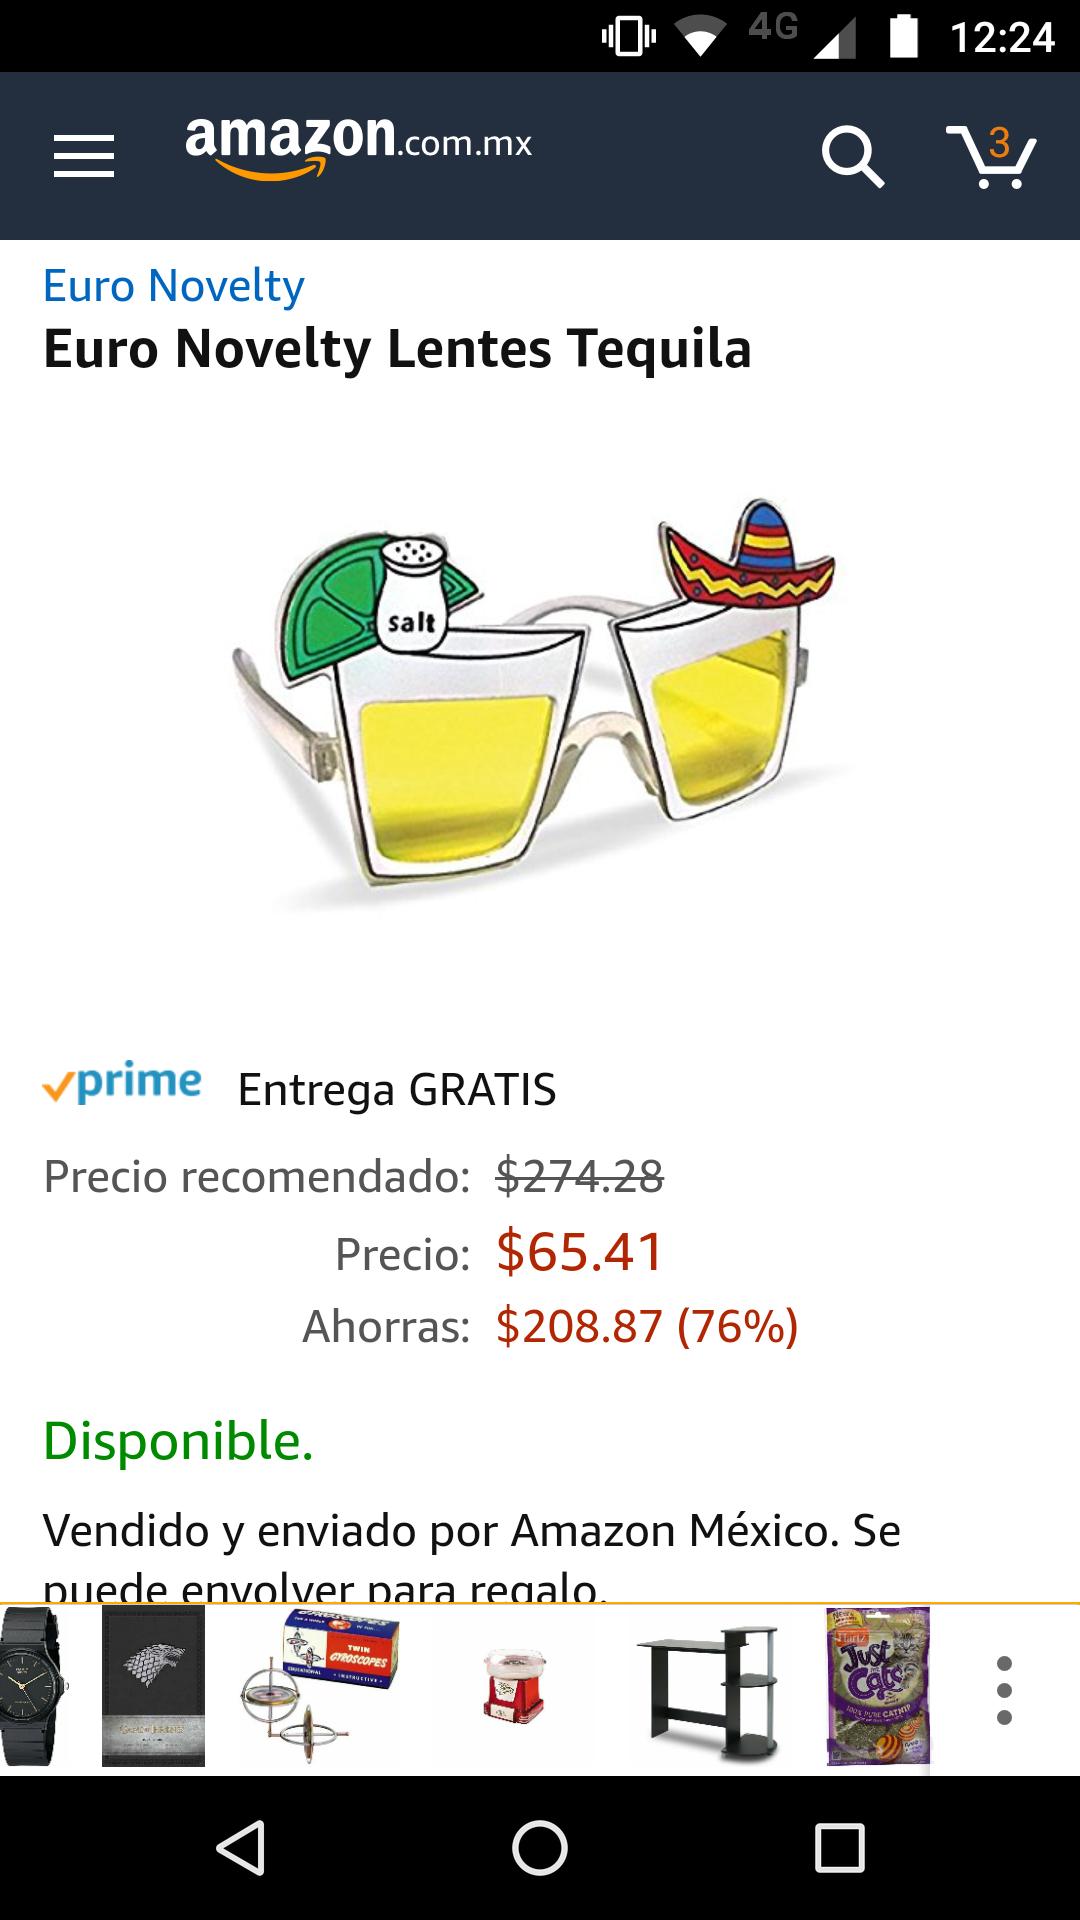 Amazon México: lentes Tequila Euro Novelty